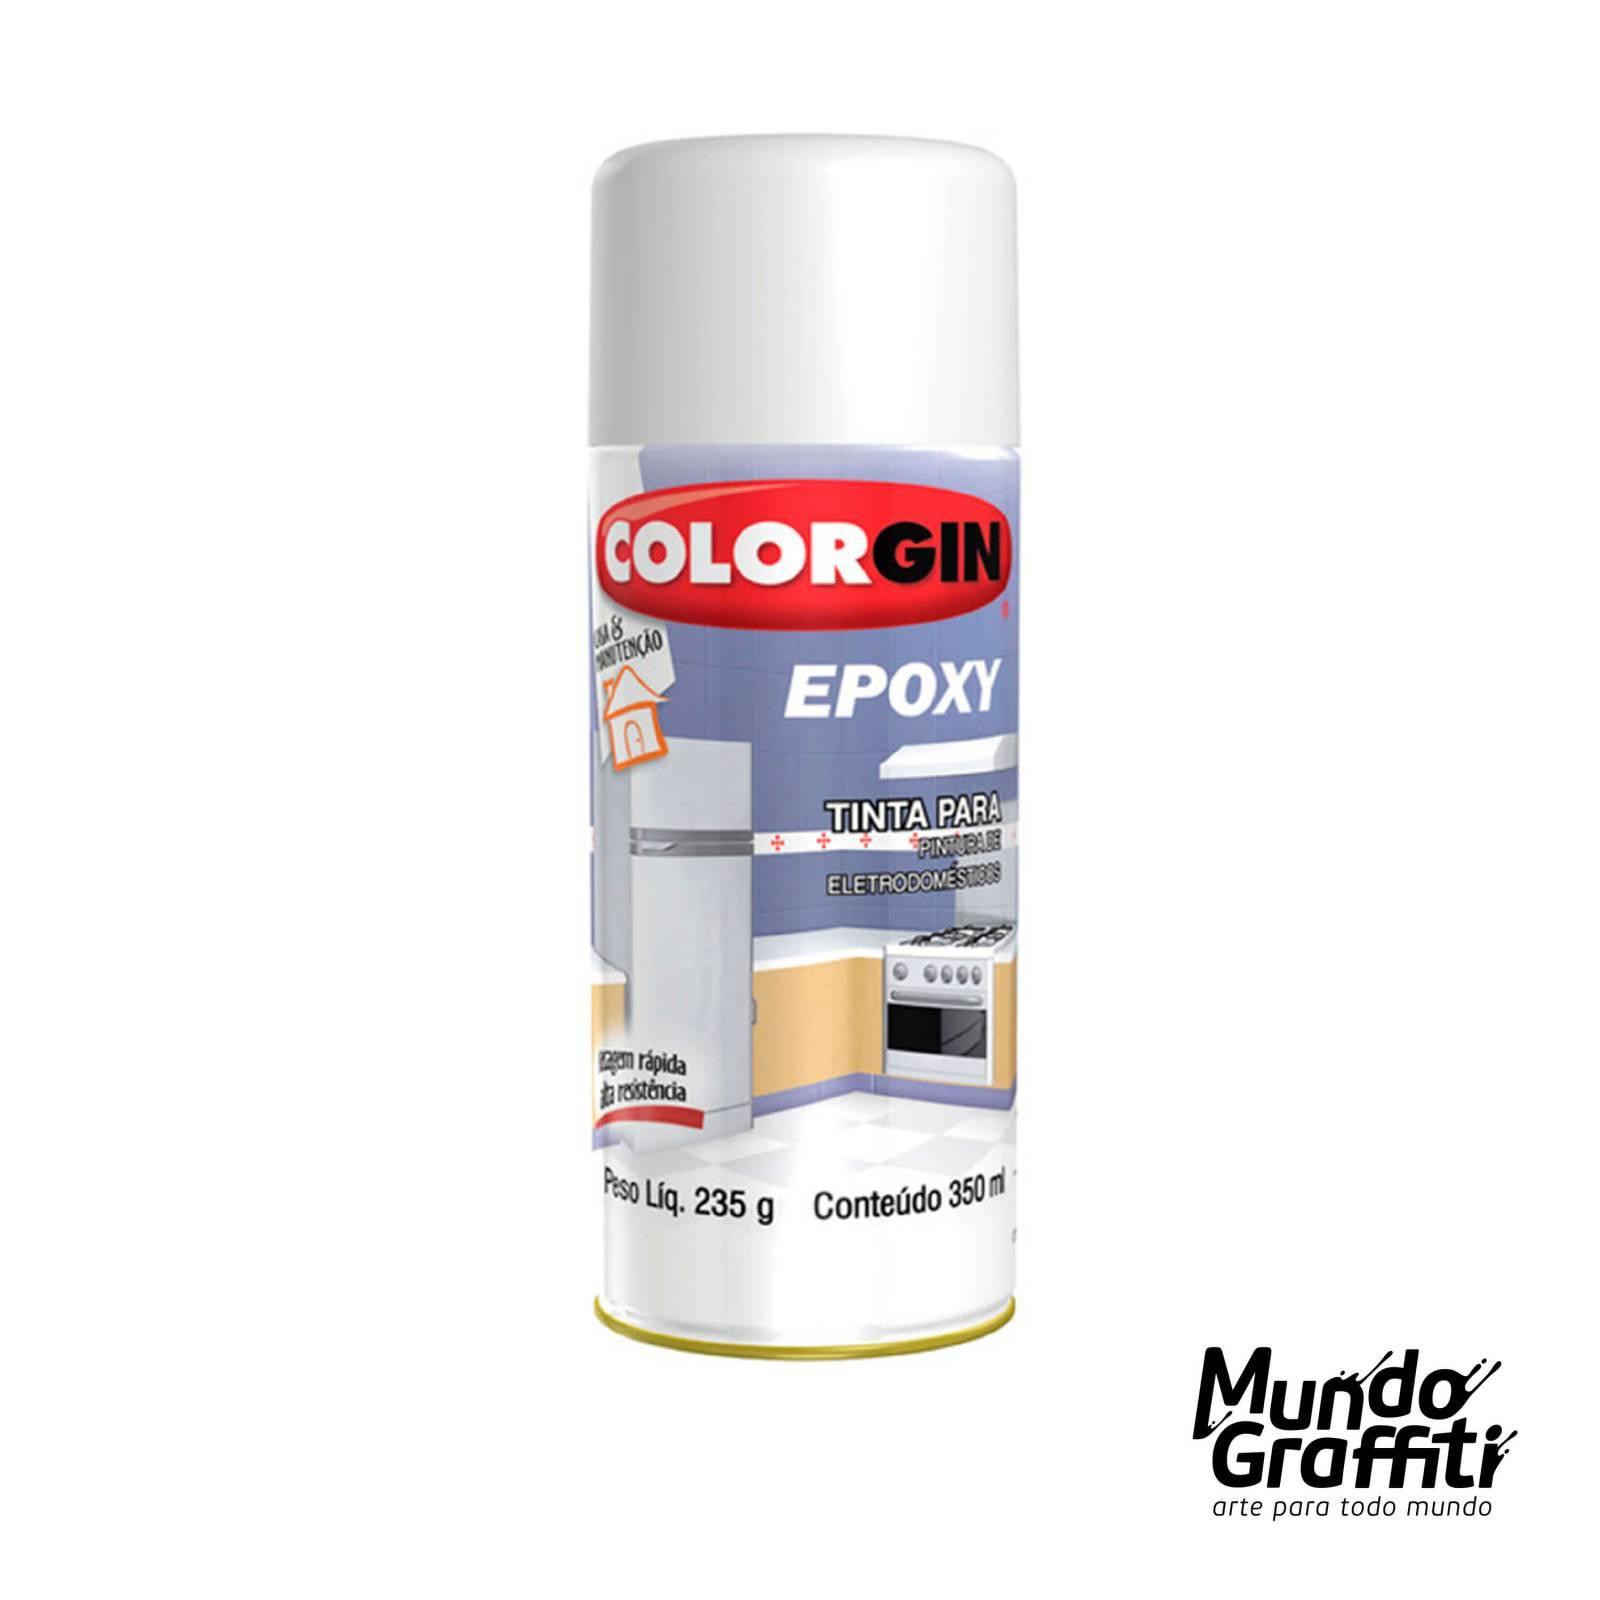 Tinta Spray Colorgin Epoxy 852 Branco Brilhante 350ml - Mundo Graffiti